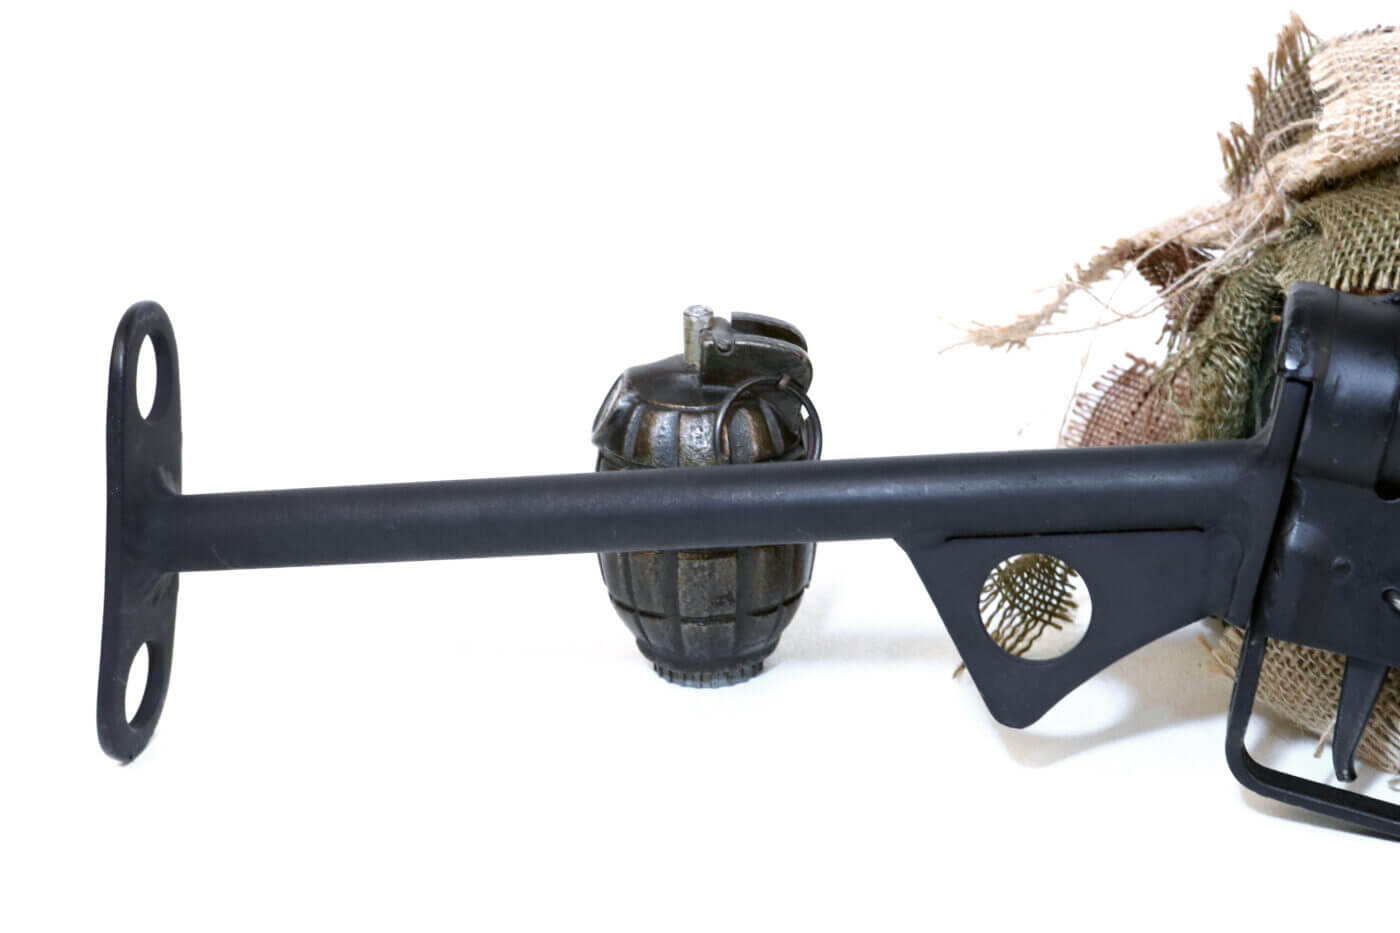 Crude T-stock on Sten gun